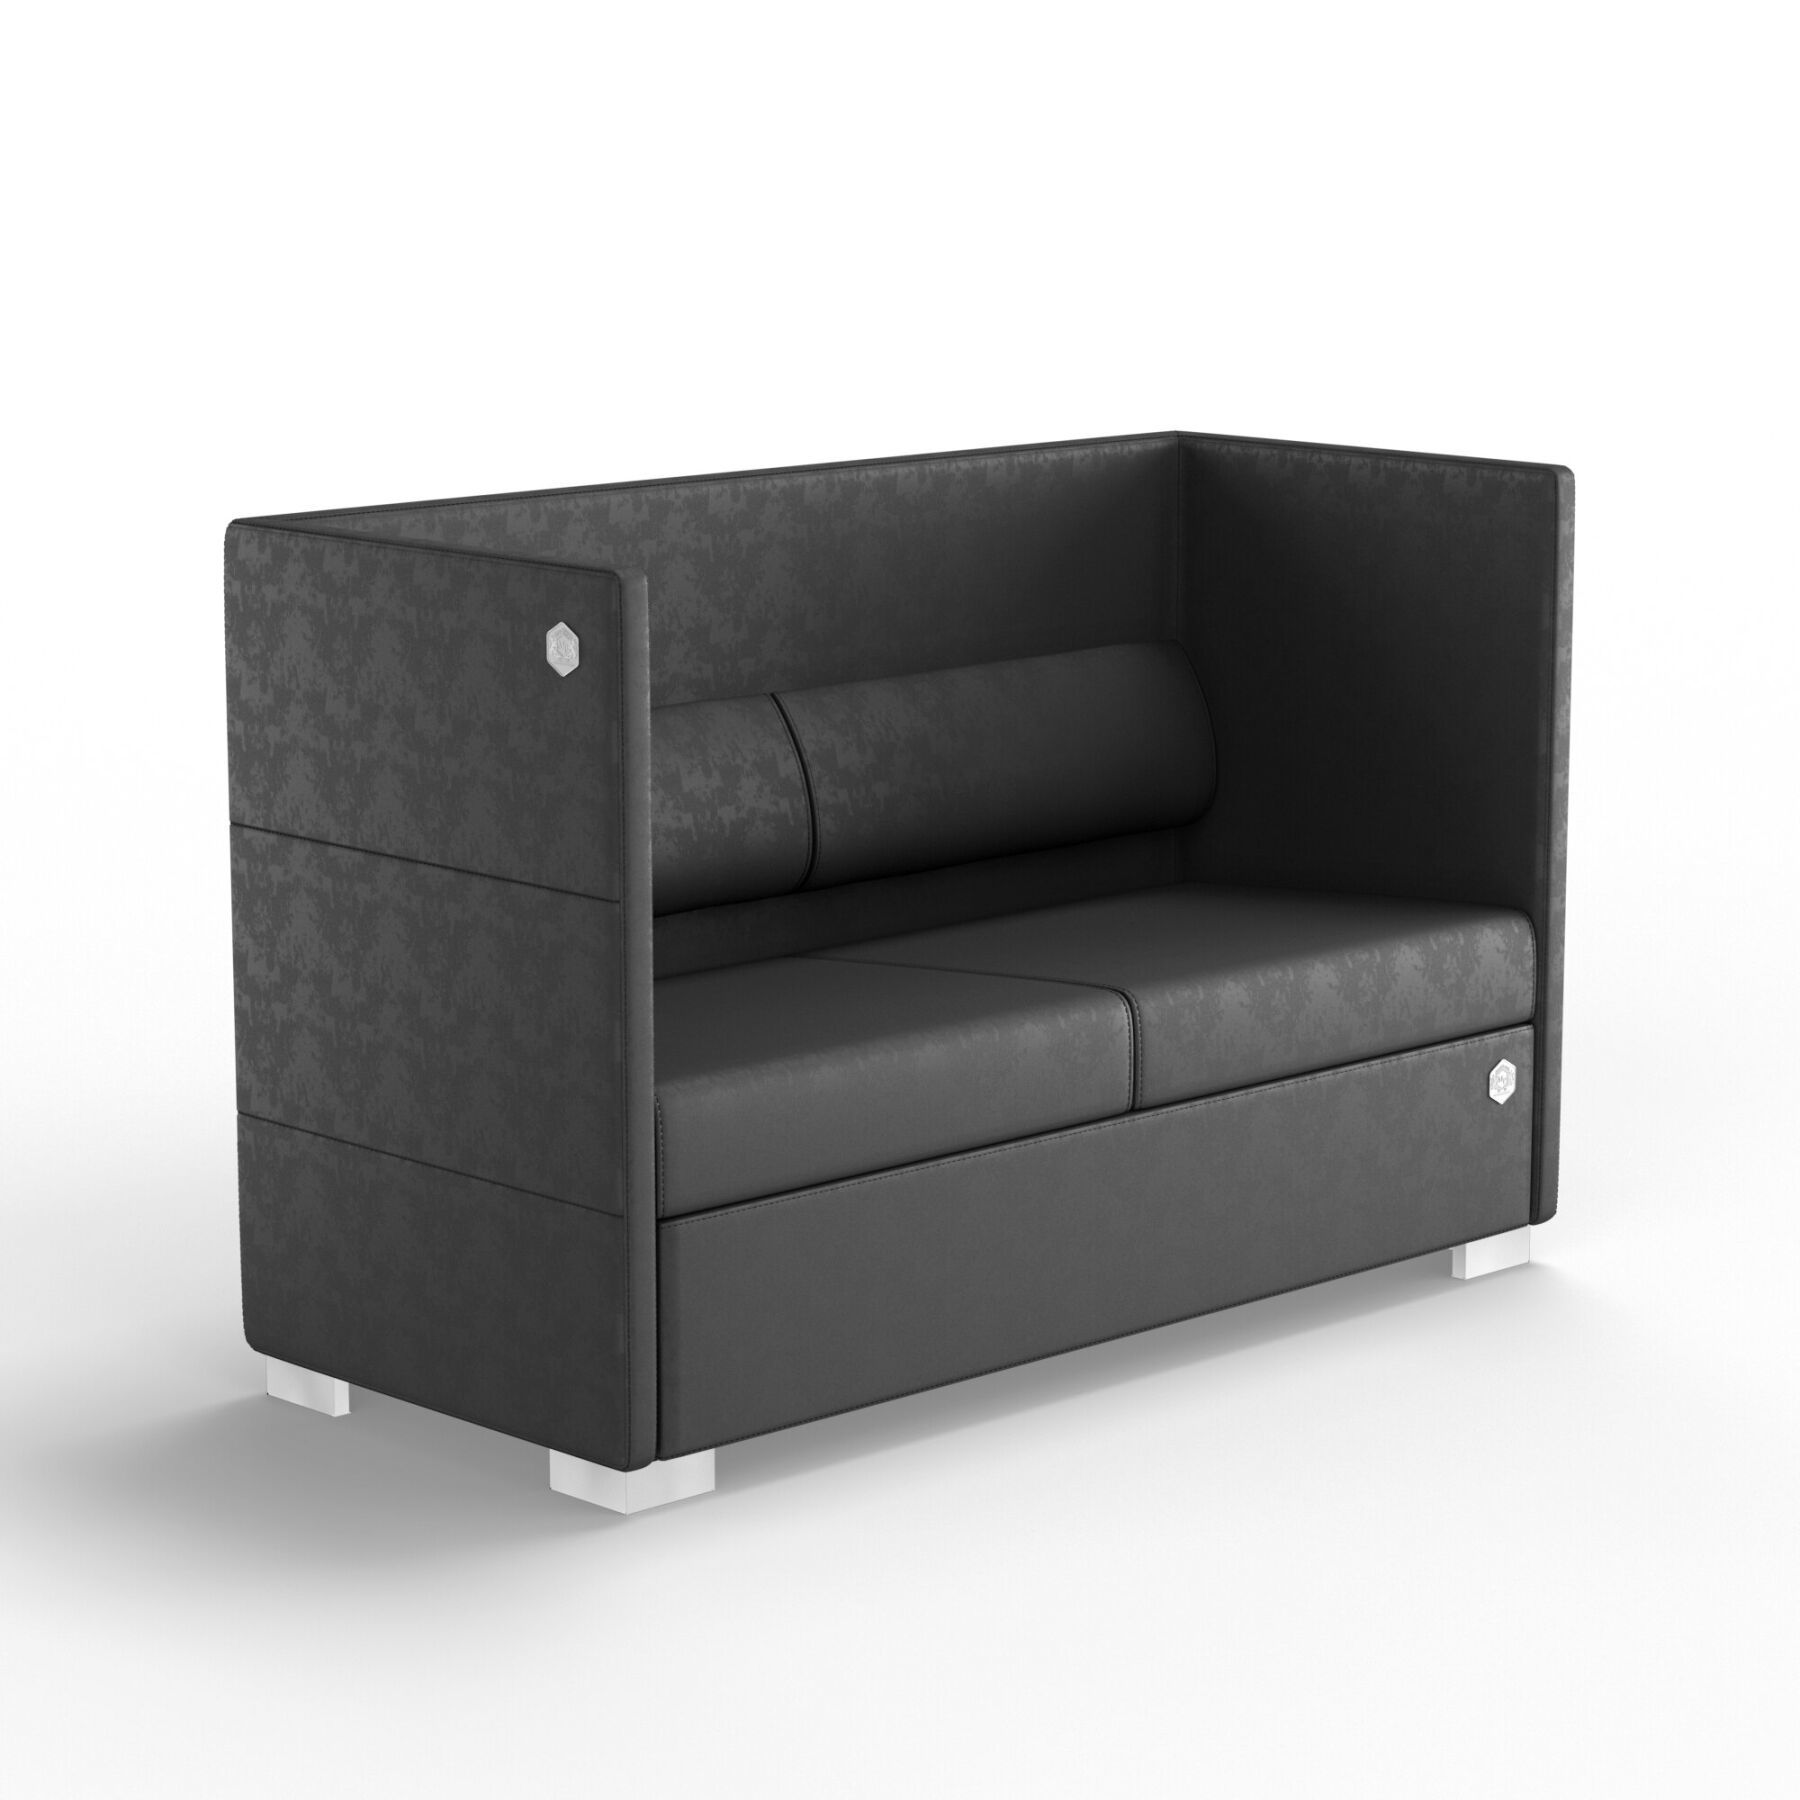 Двухместный диван KULIK SYSTEM CONFERENCE Антара 2